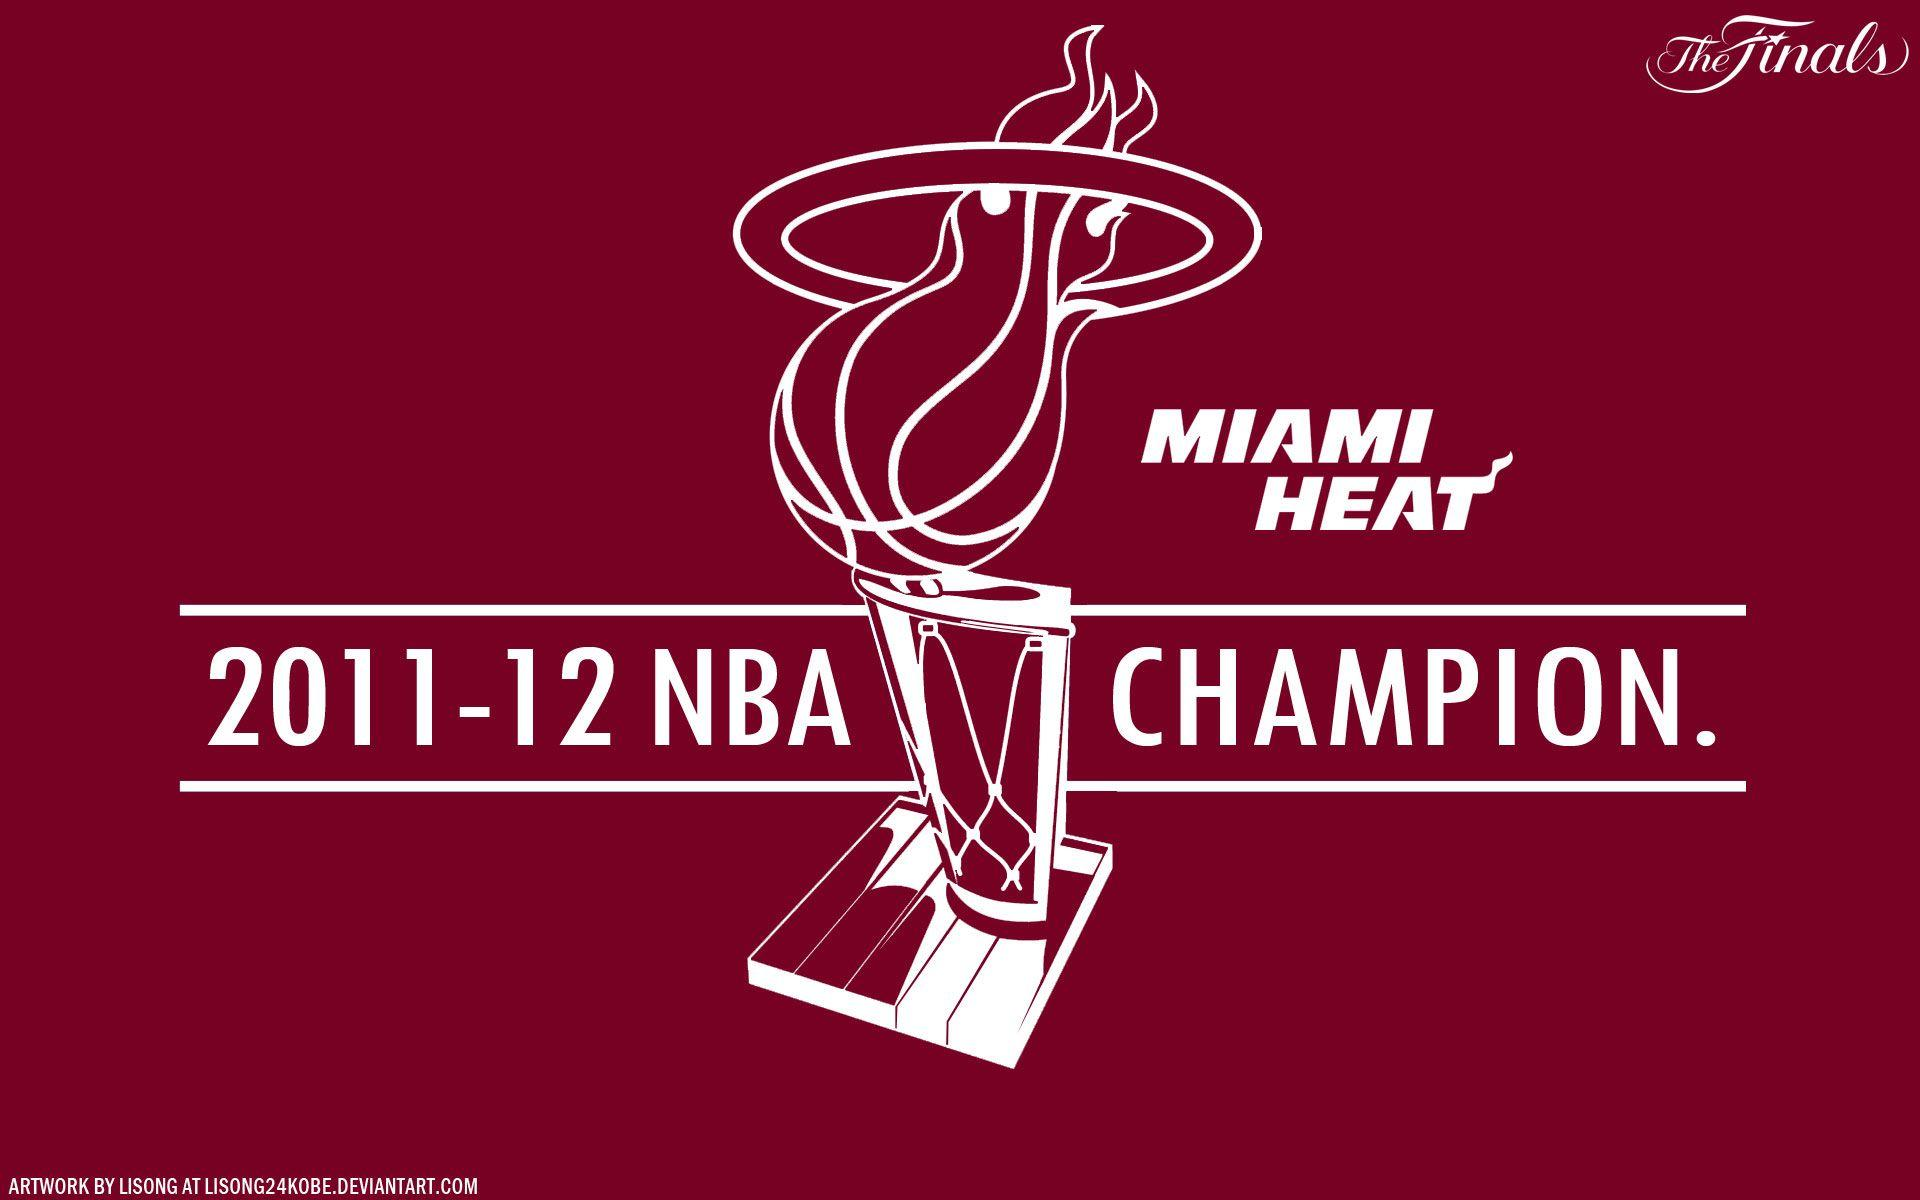 Miami Heat Champions Wallpapers - Wallpaper Cave